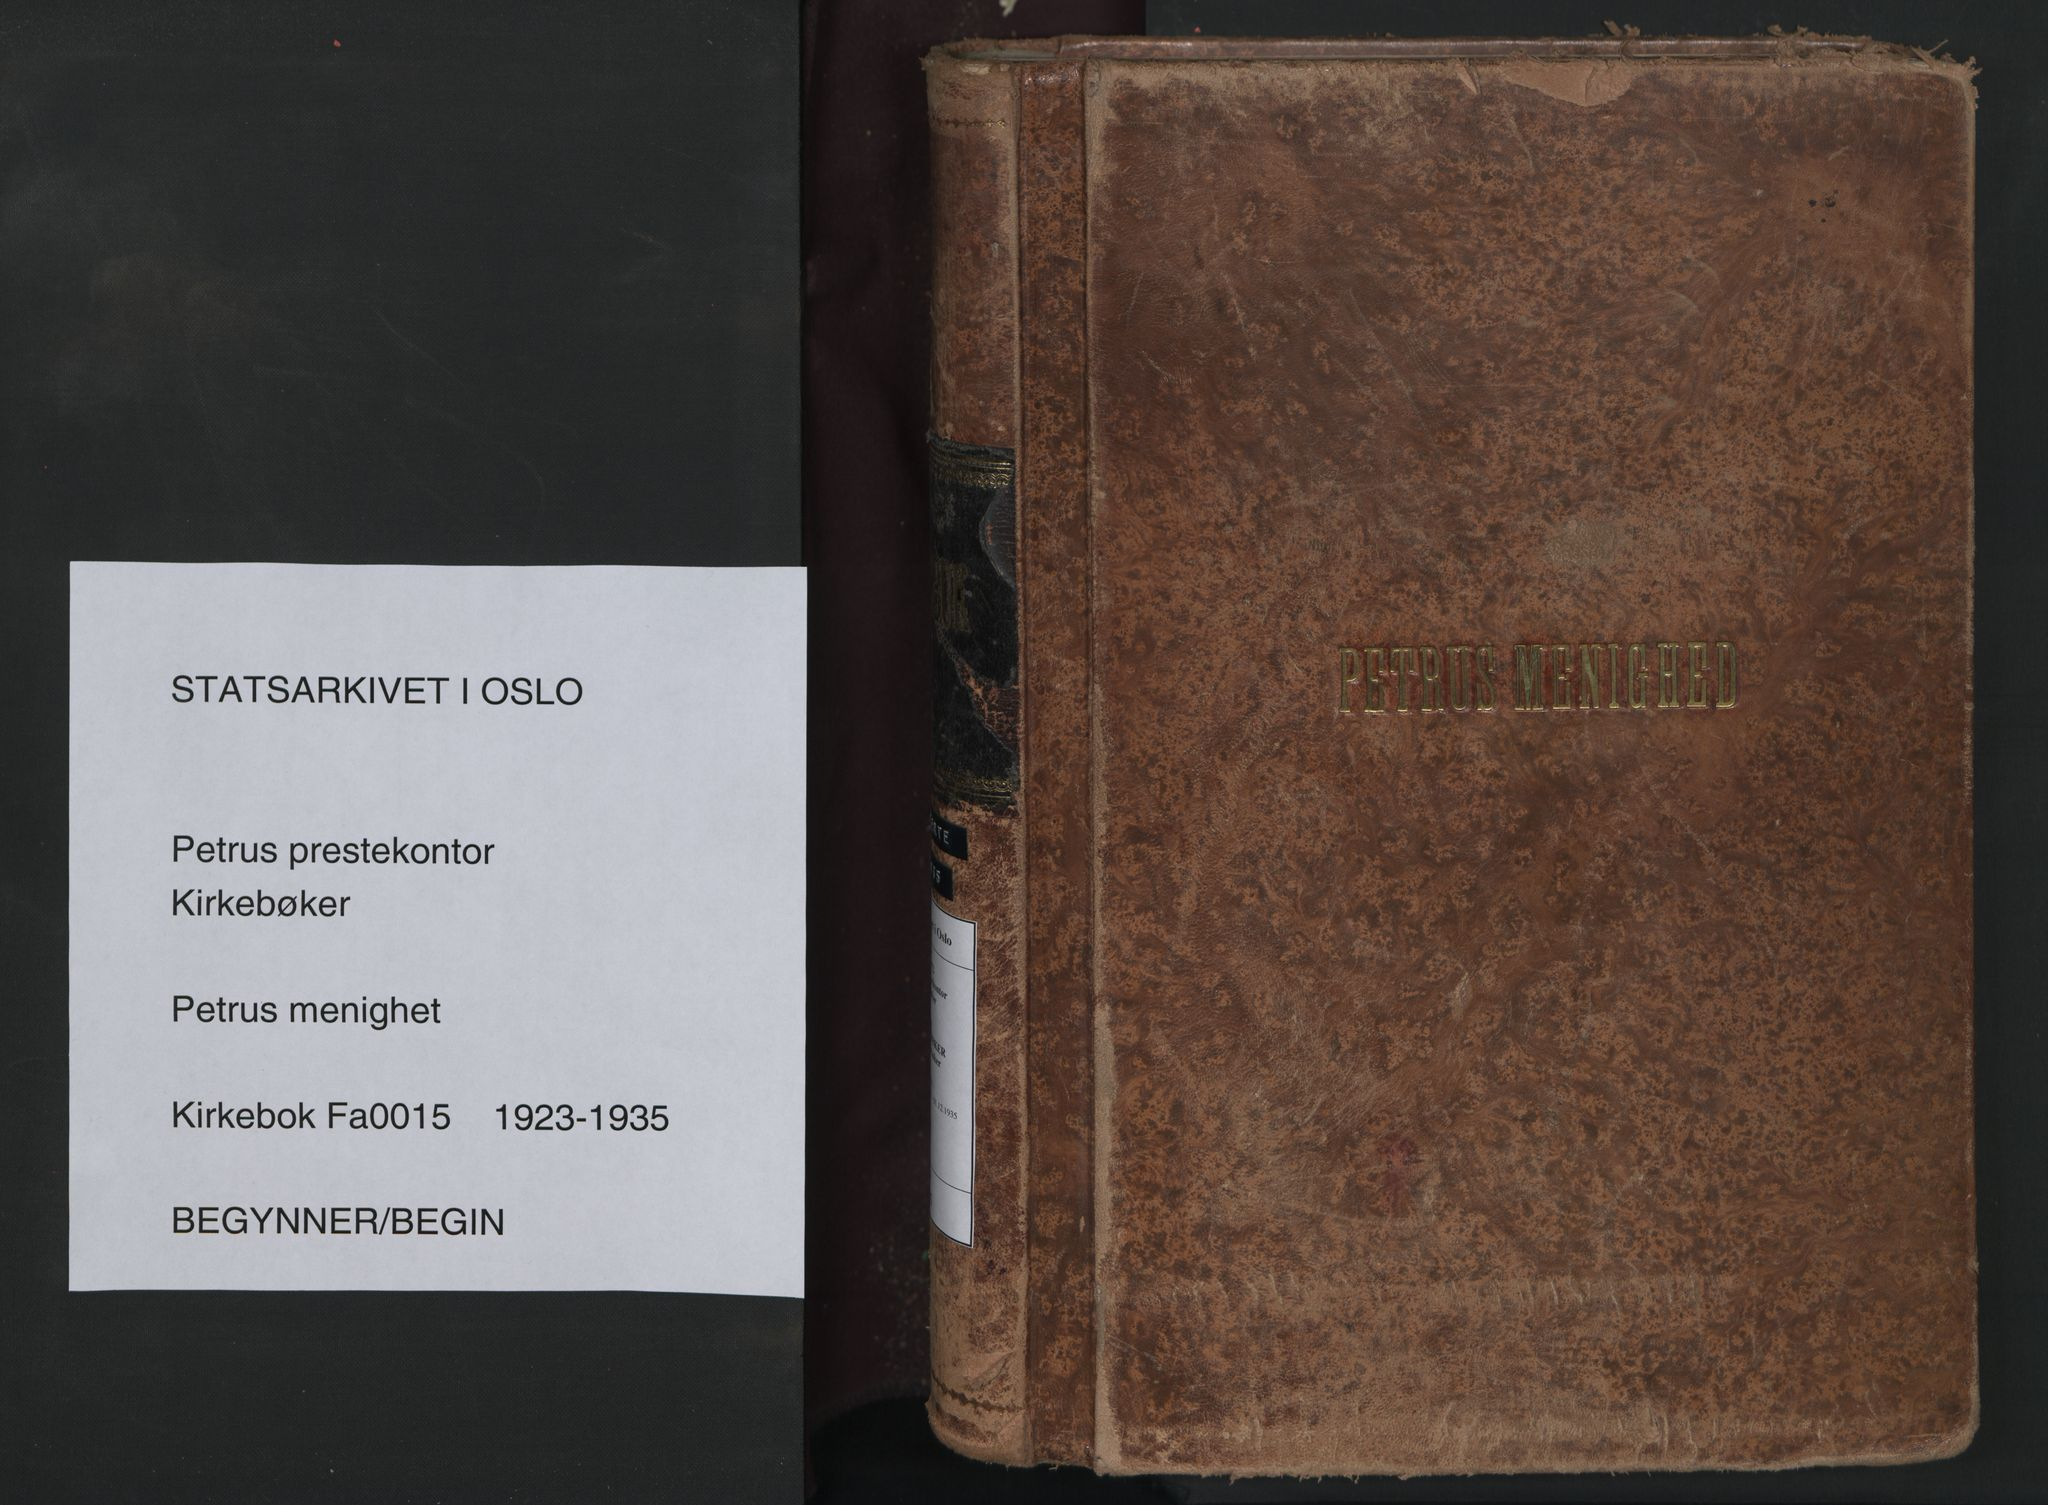 SAO, Petrus prestekontor Kirkebøker, F/Fa/L0015: Ministerialbok nr. 15, 1923-1935